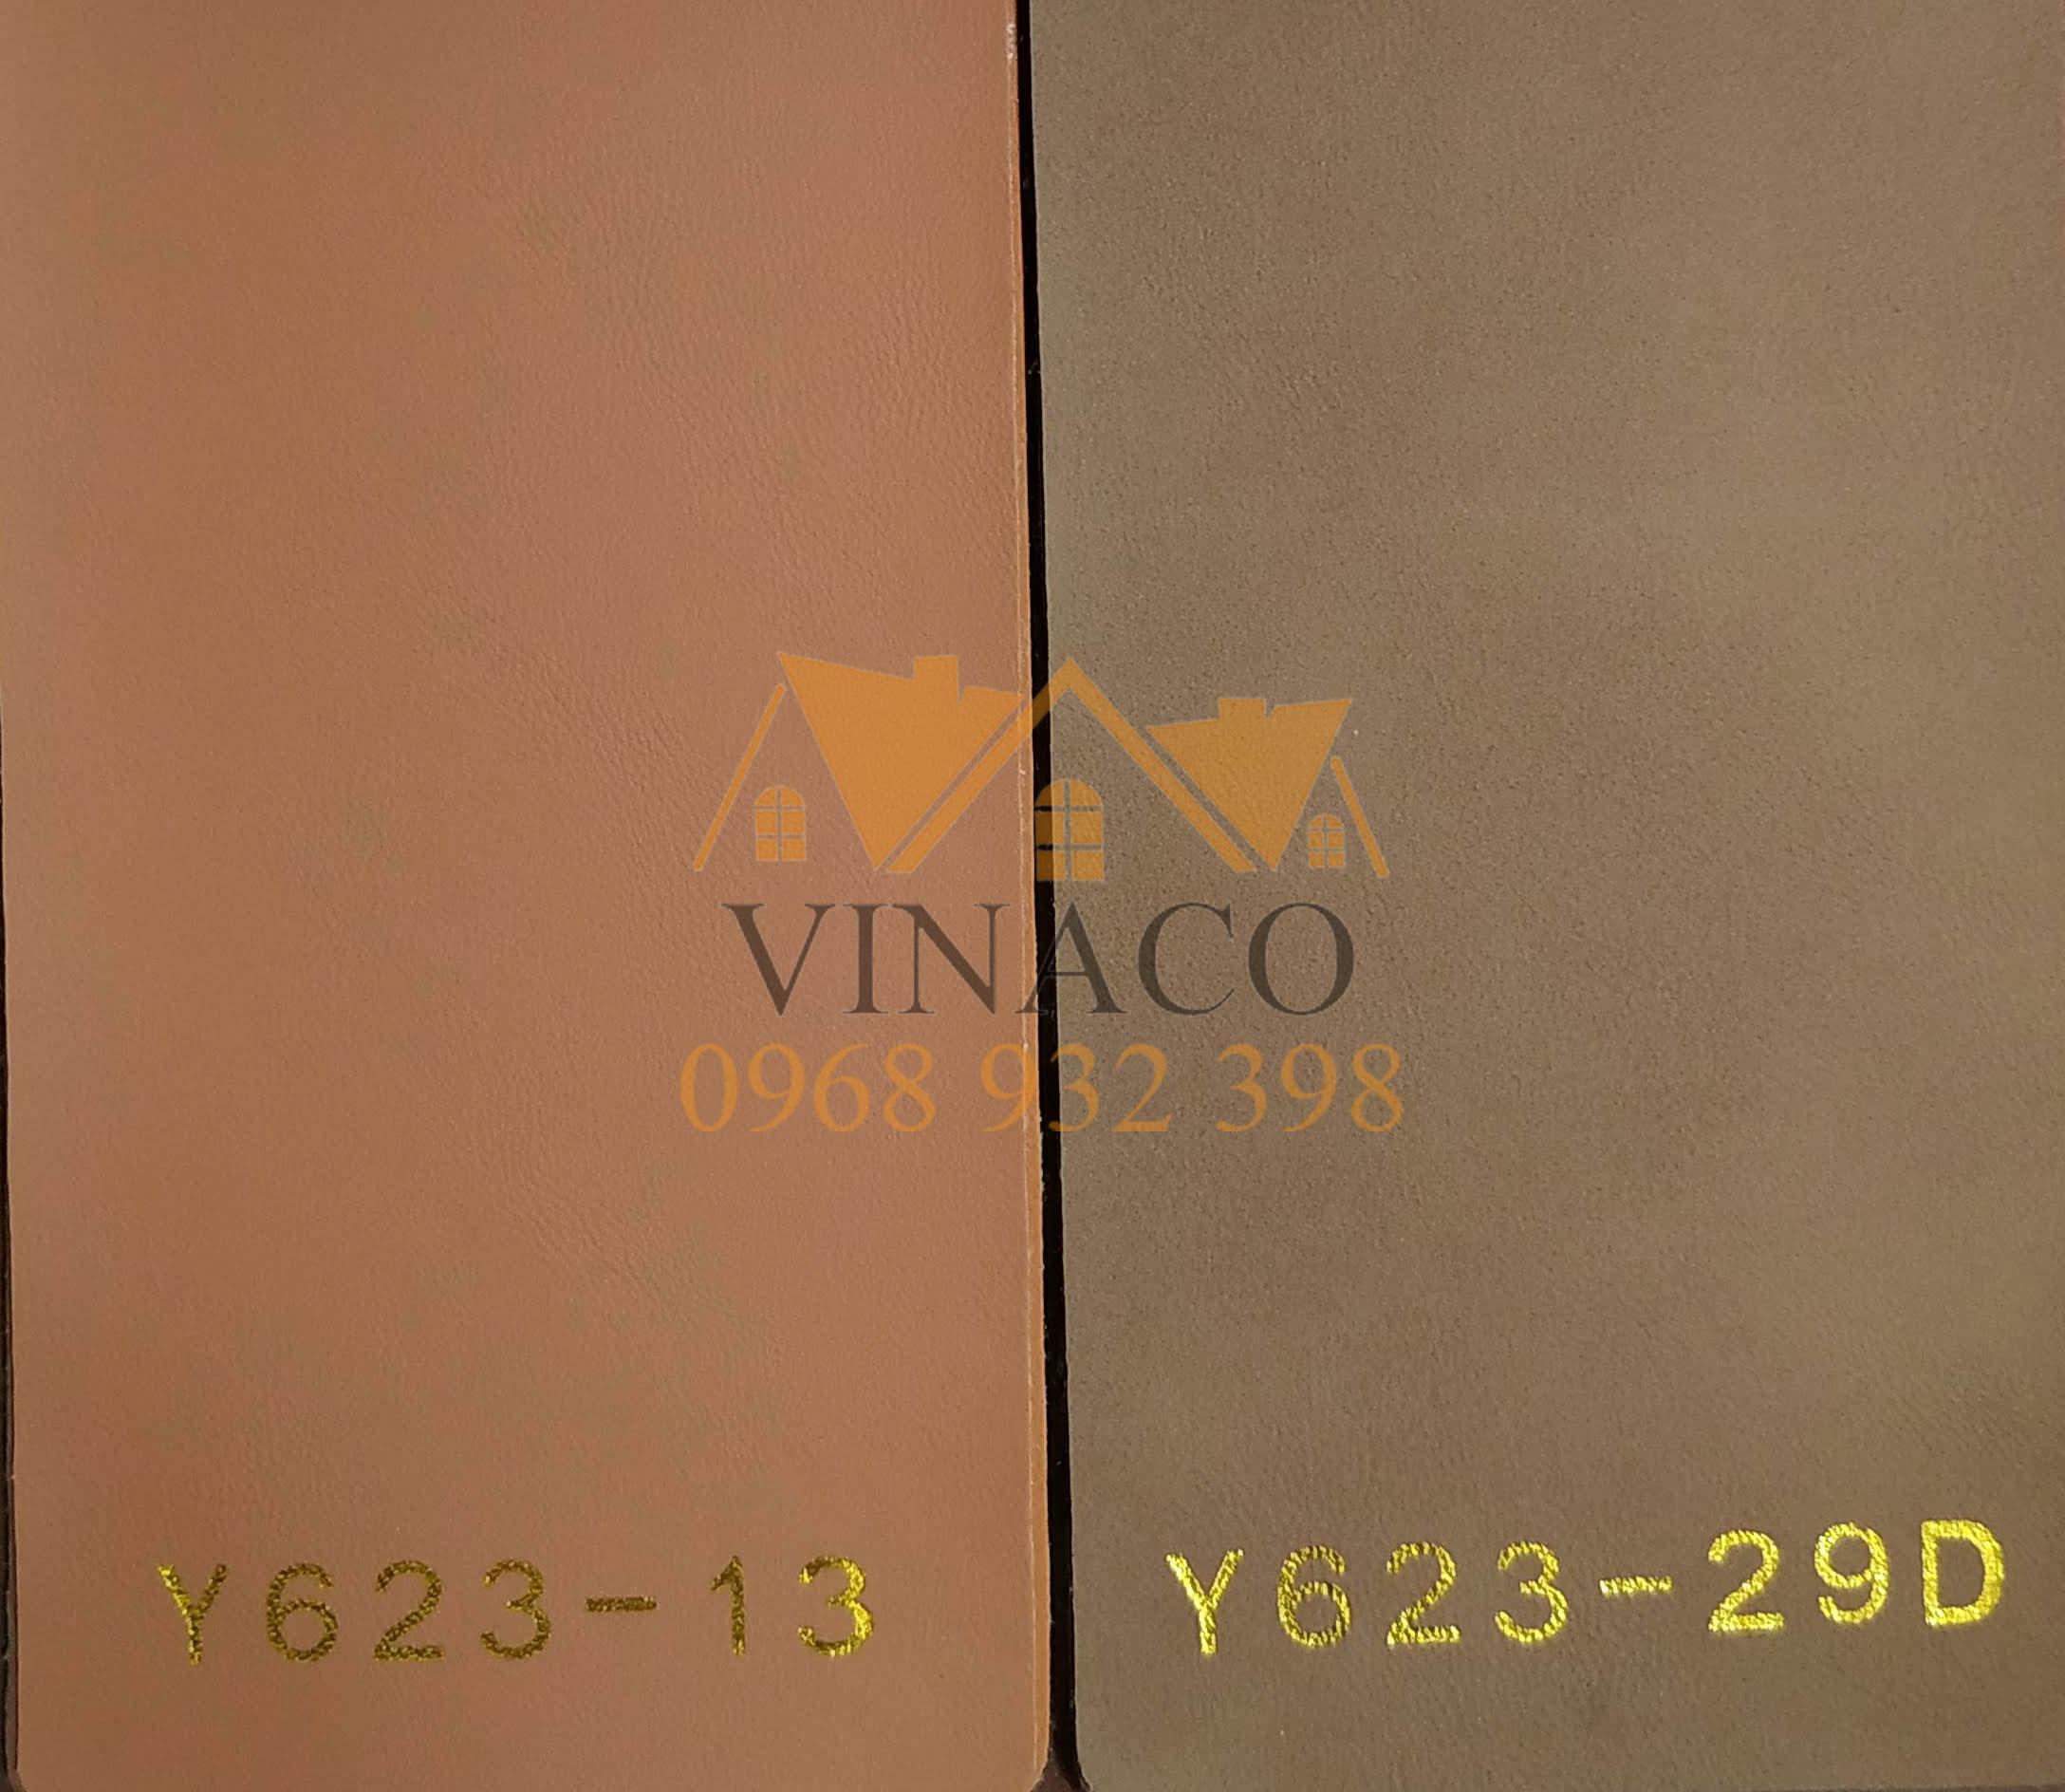 Bọc ghế sofa da tại Vinaco bằng mẫu da này